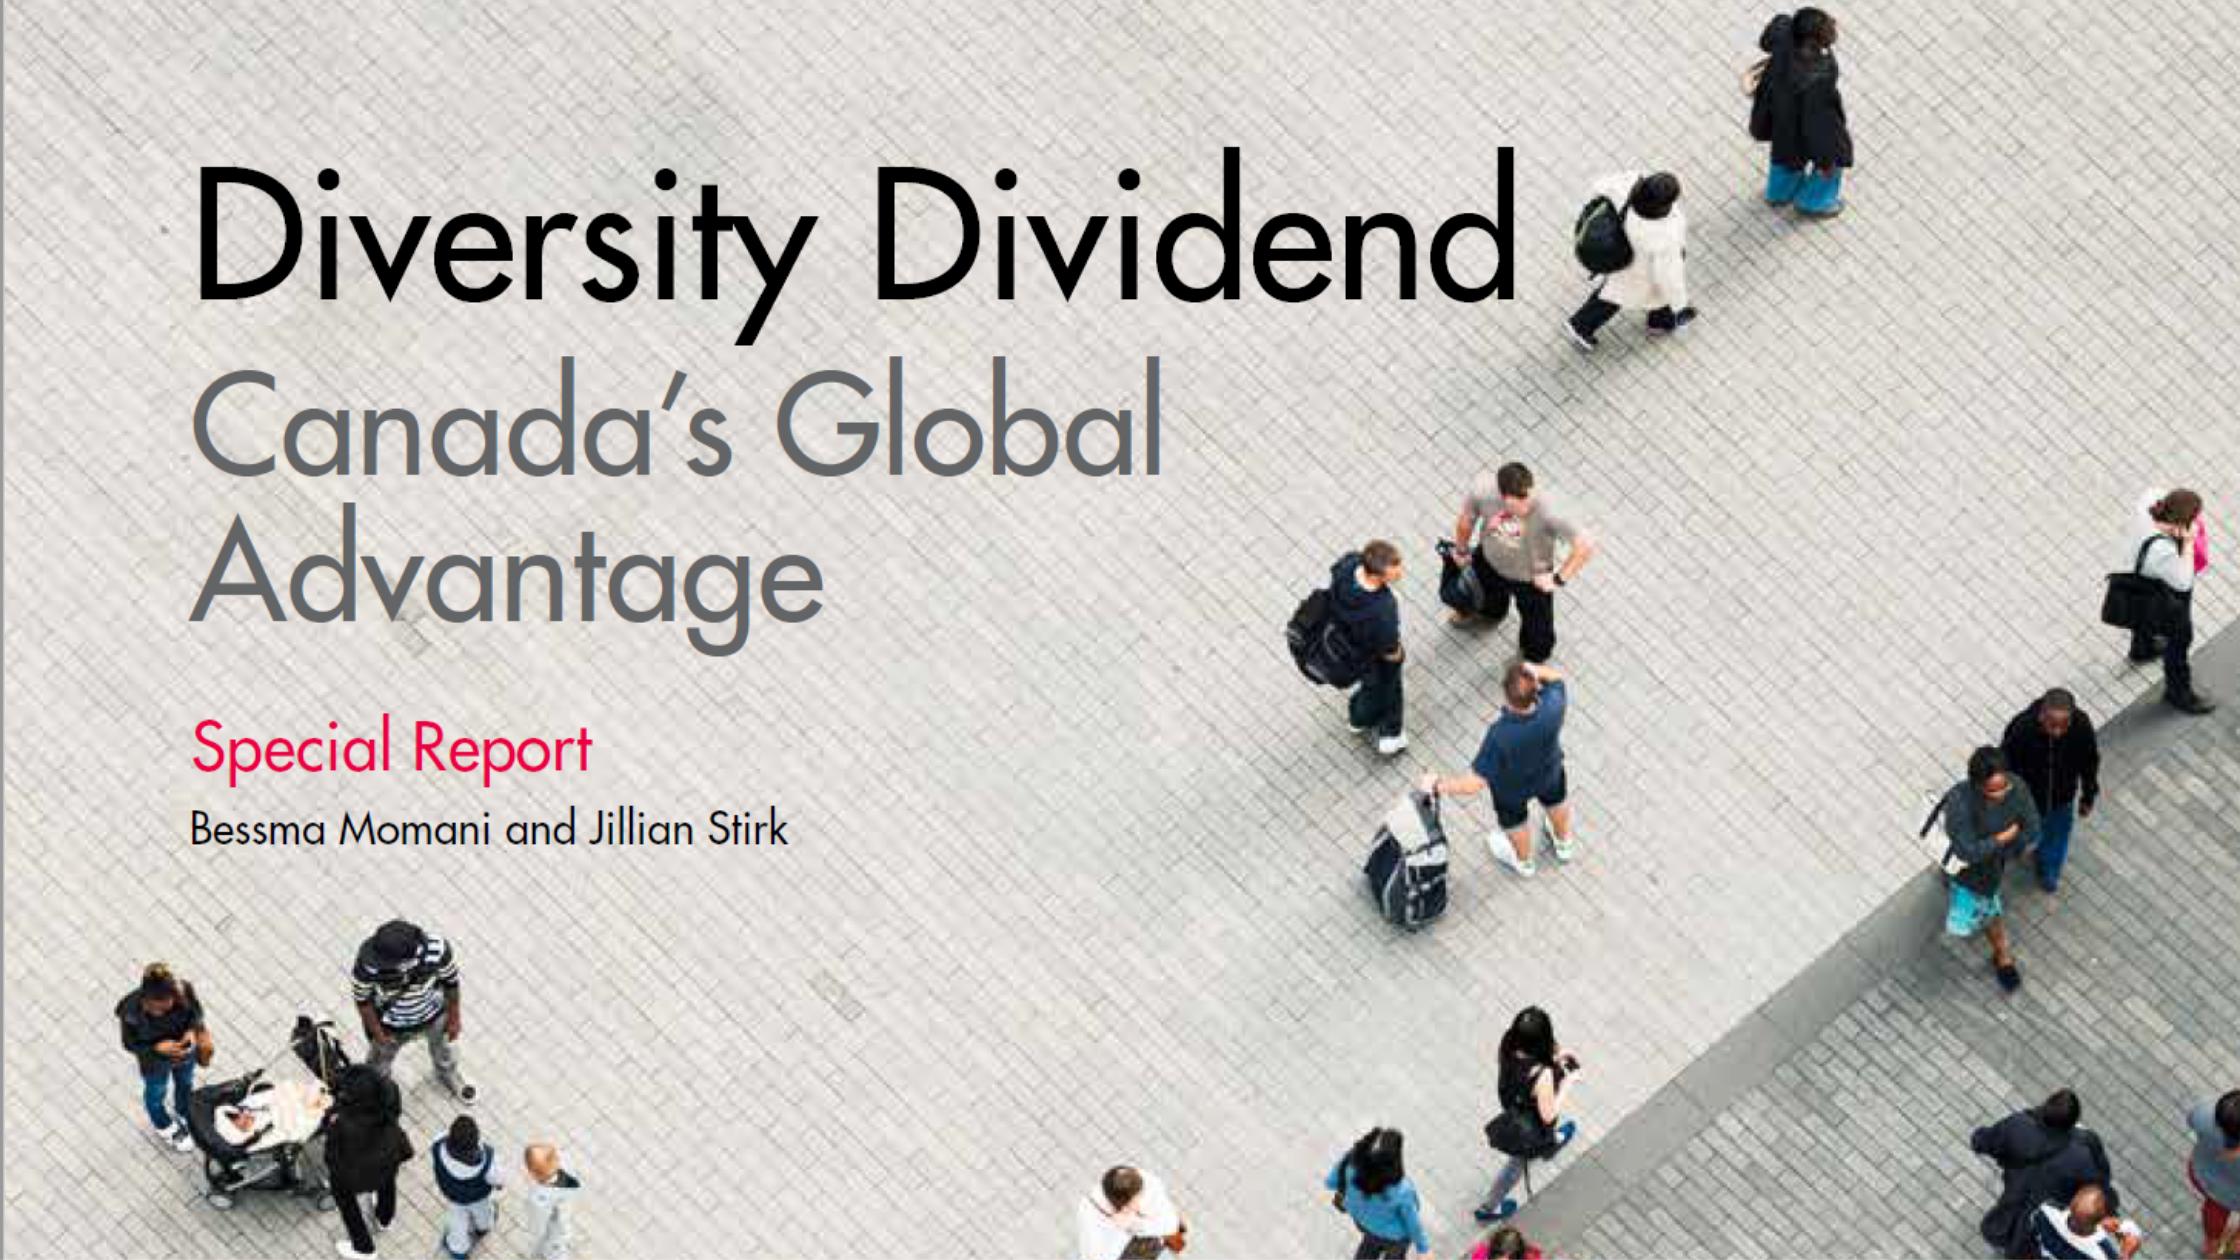 Diversity Dividend: Canada's Global Advantage